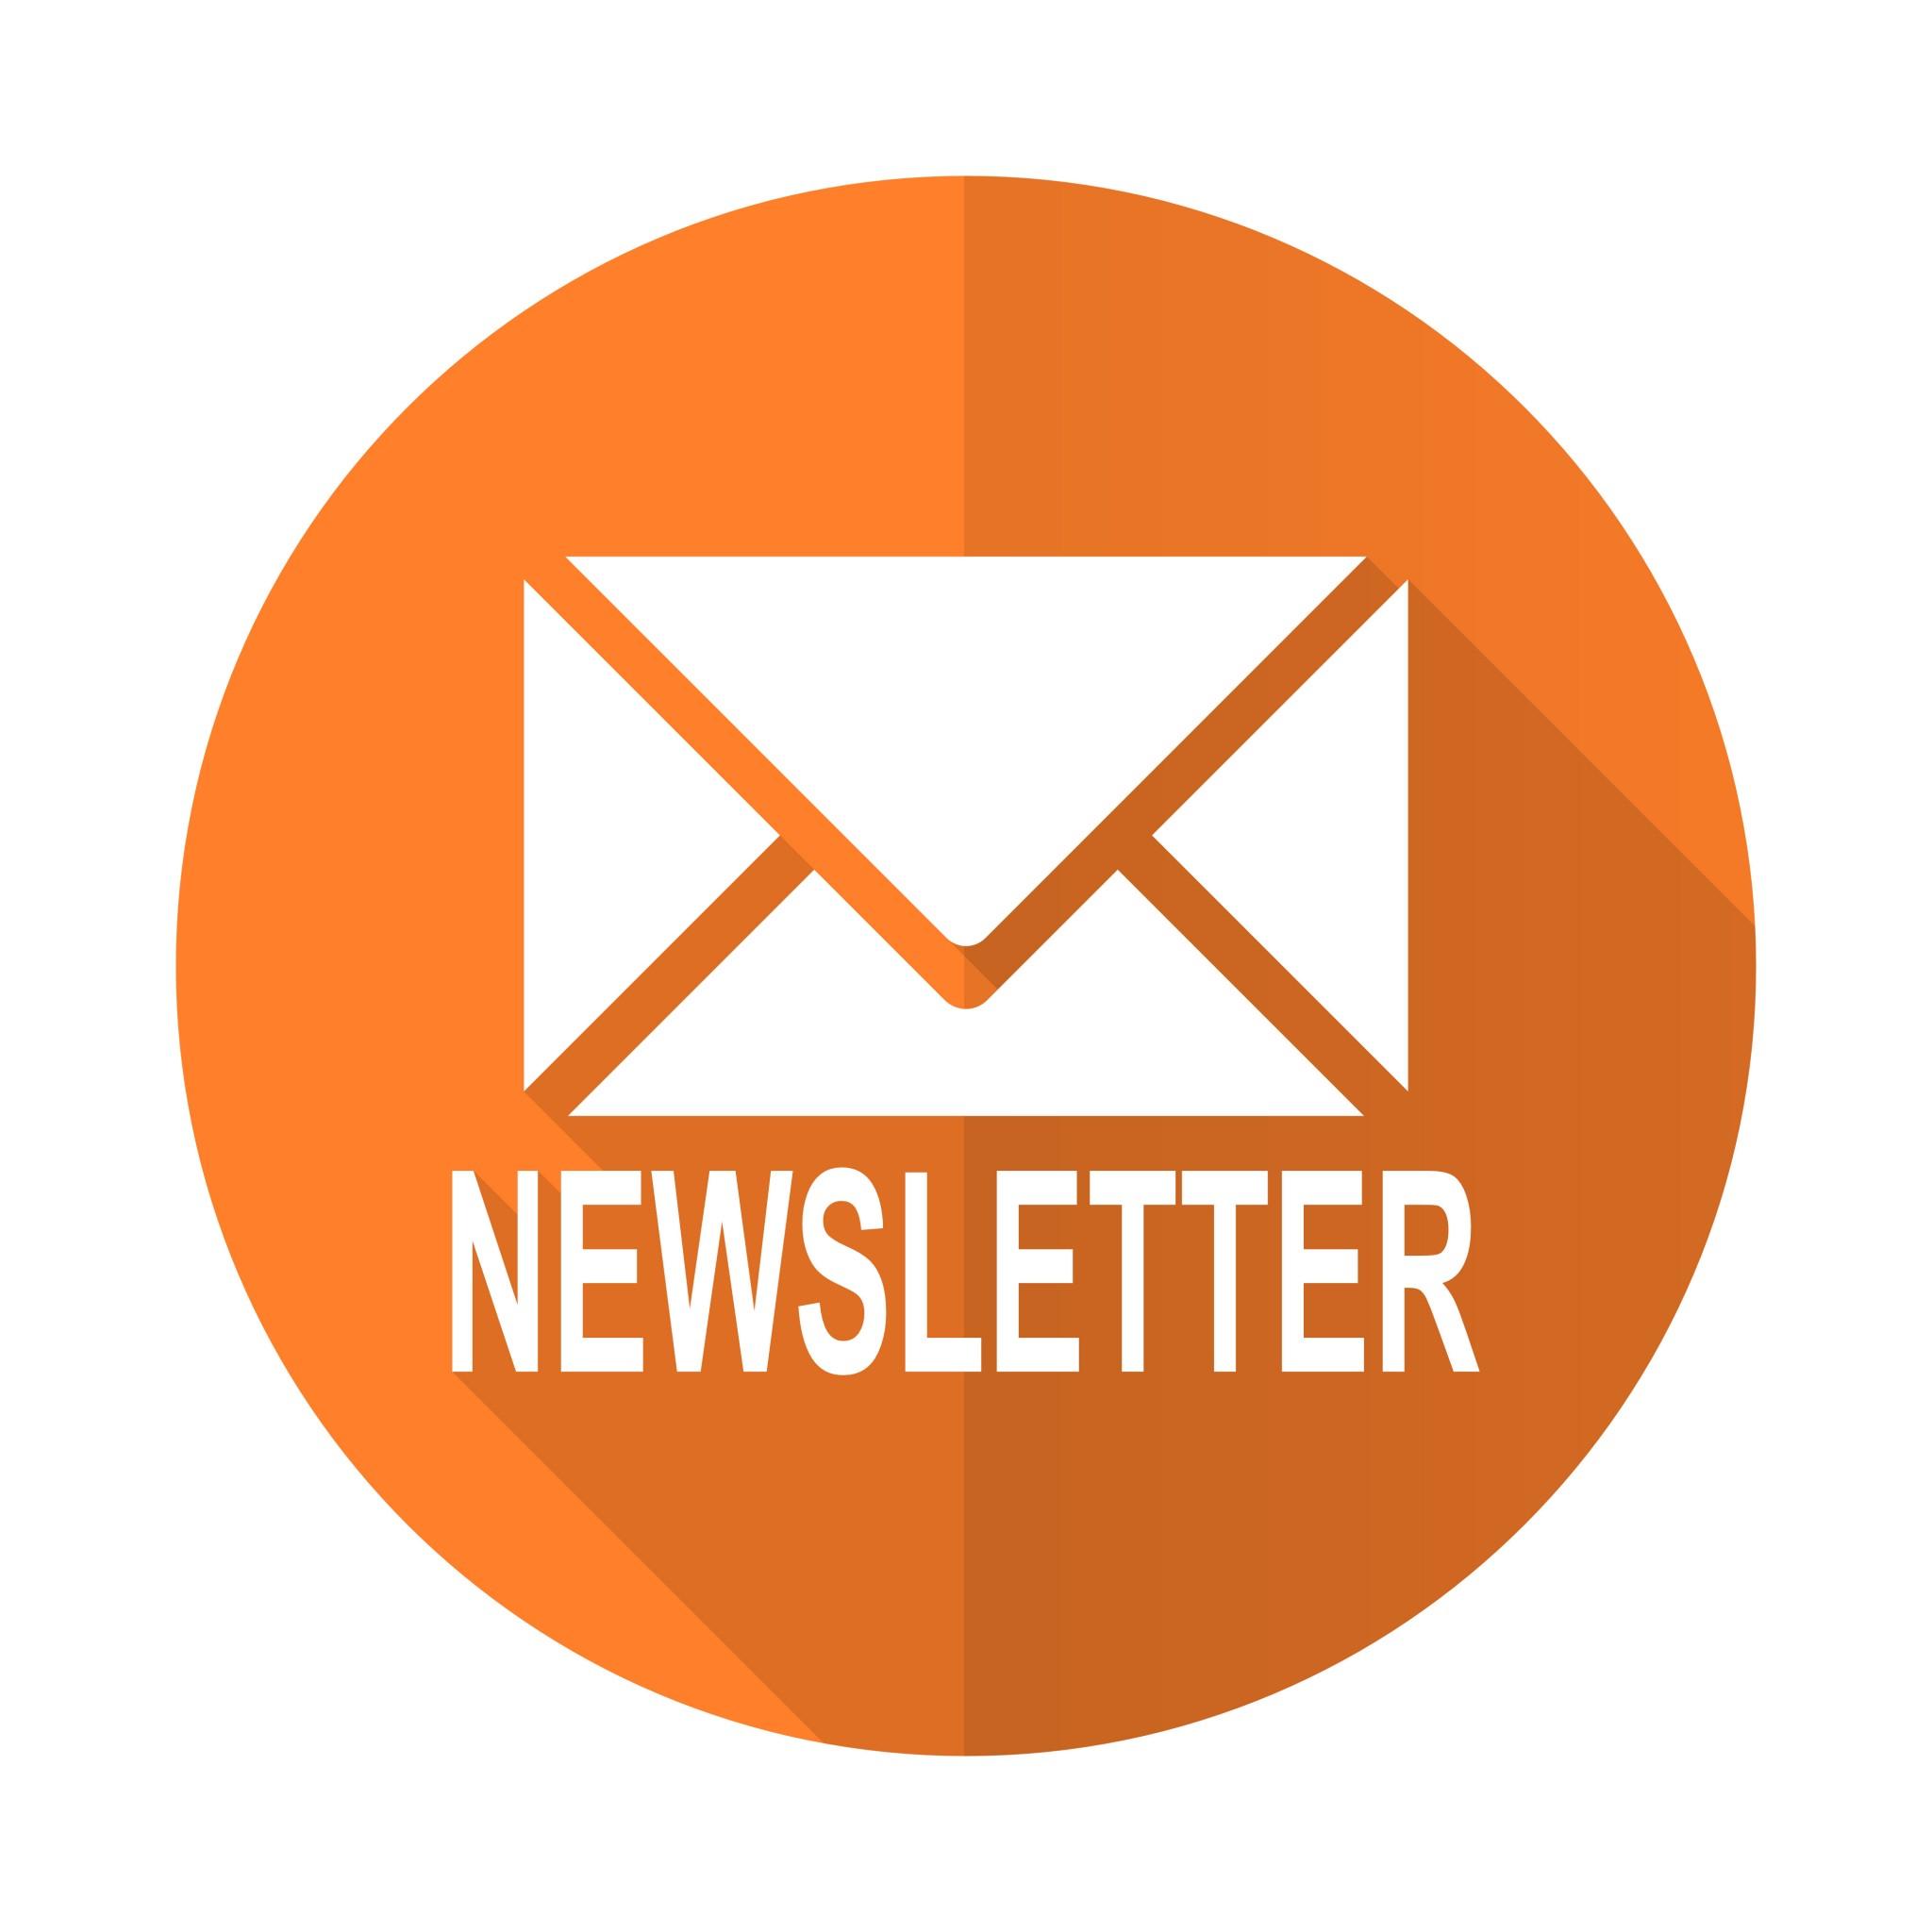 ¿Cómo hacer un newsletter o boletín de tu empresa o negocio?